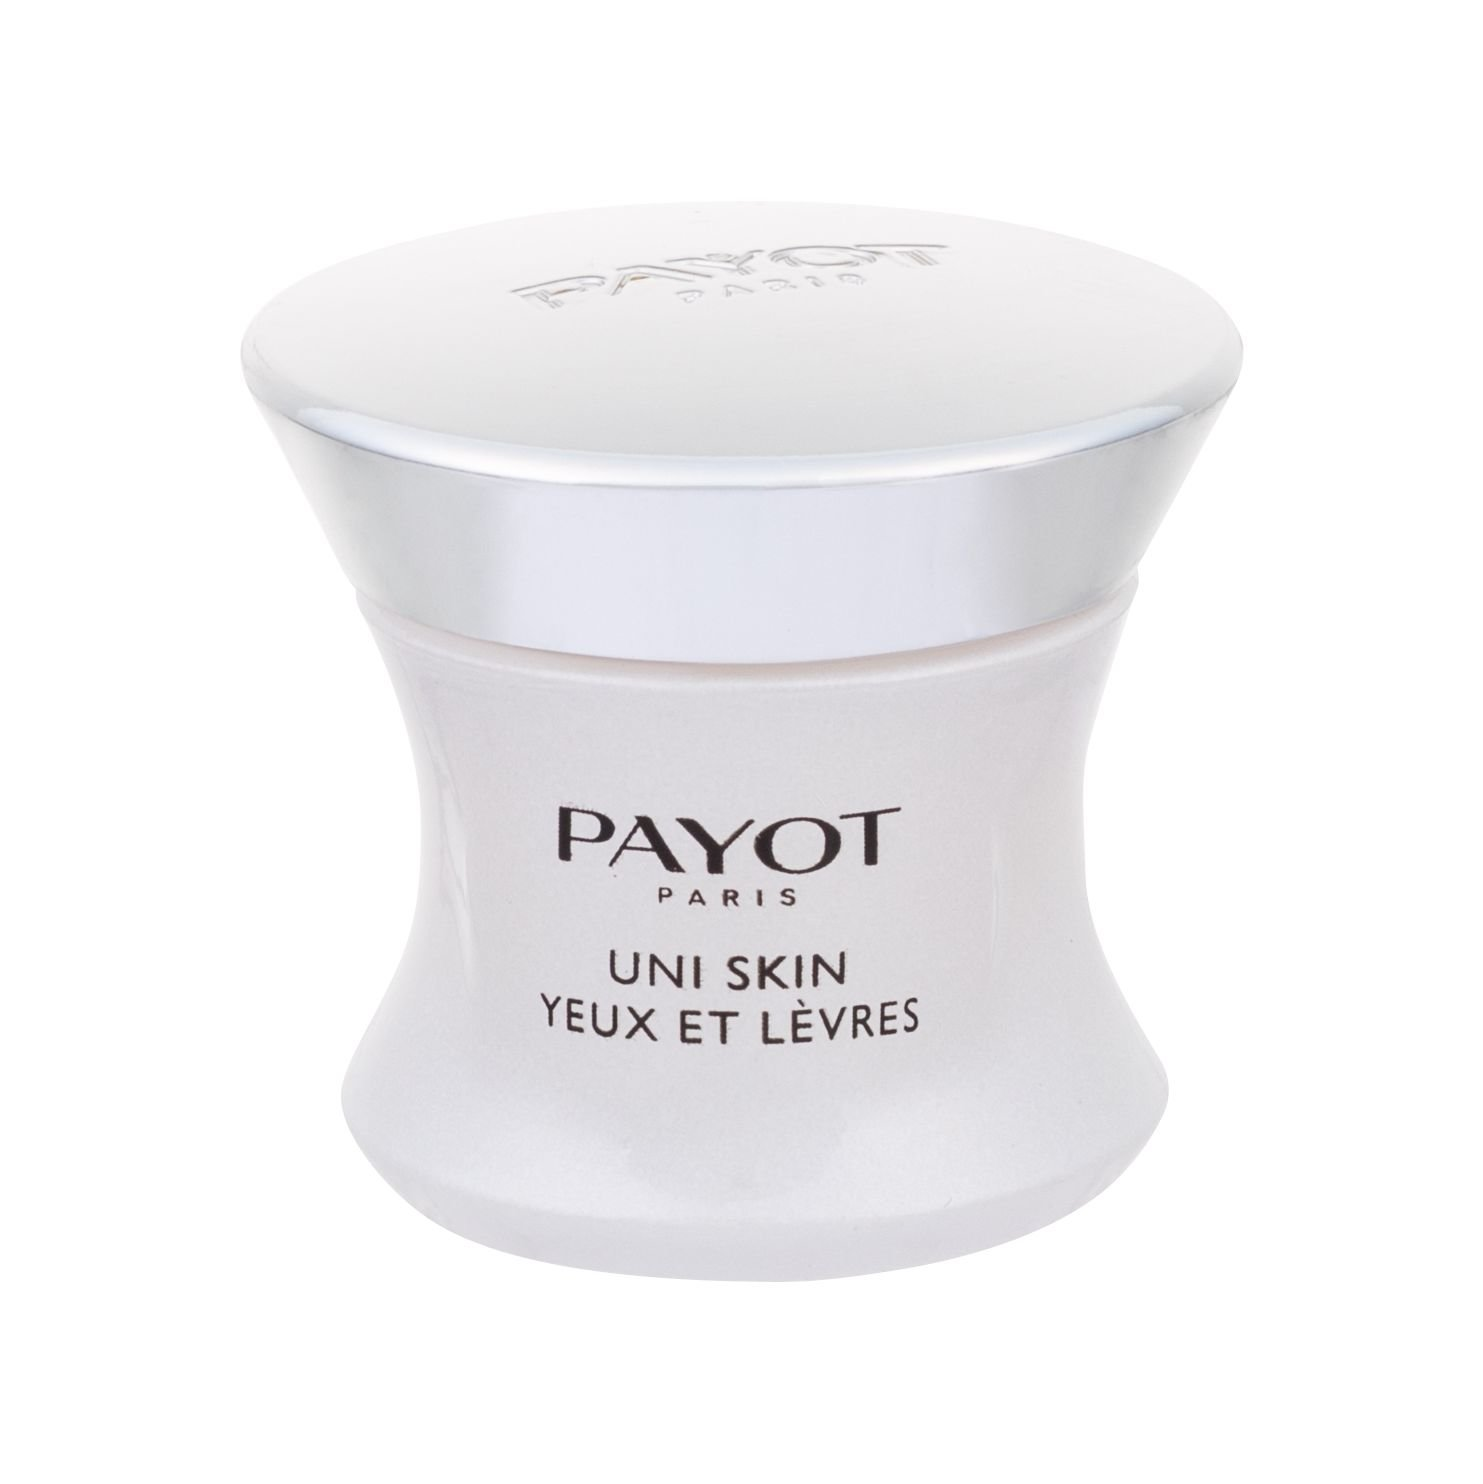 PAYOT Uni Skin Eye Cream 15ml